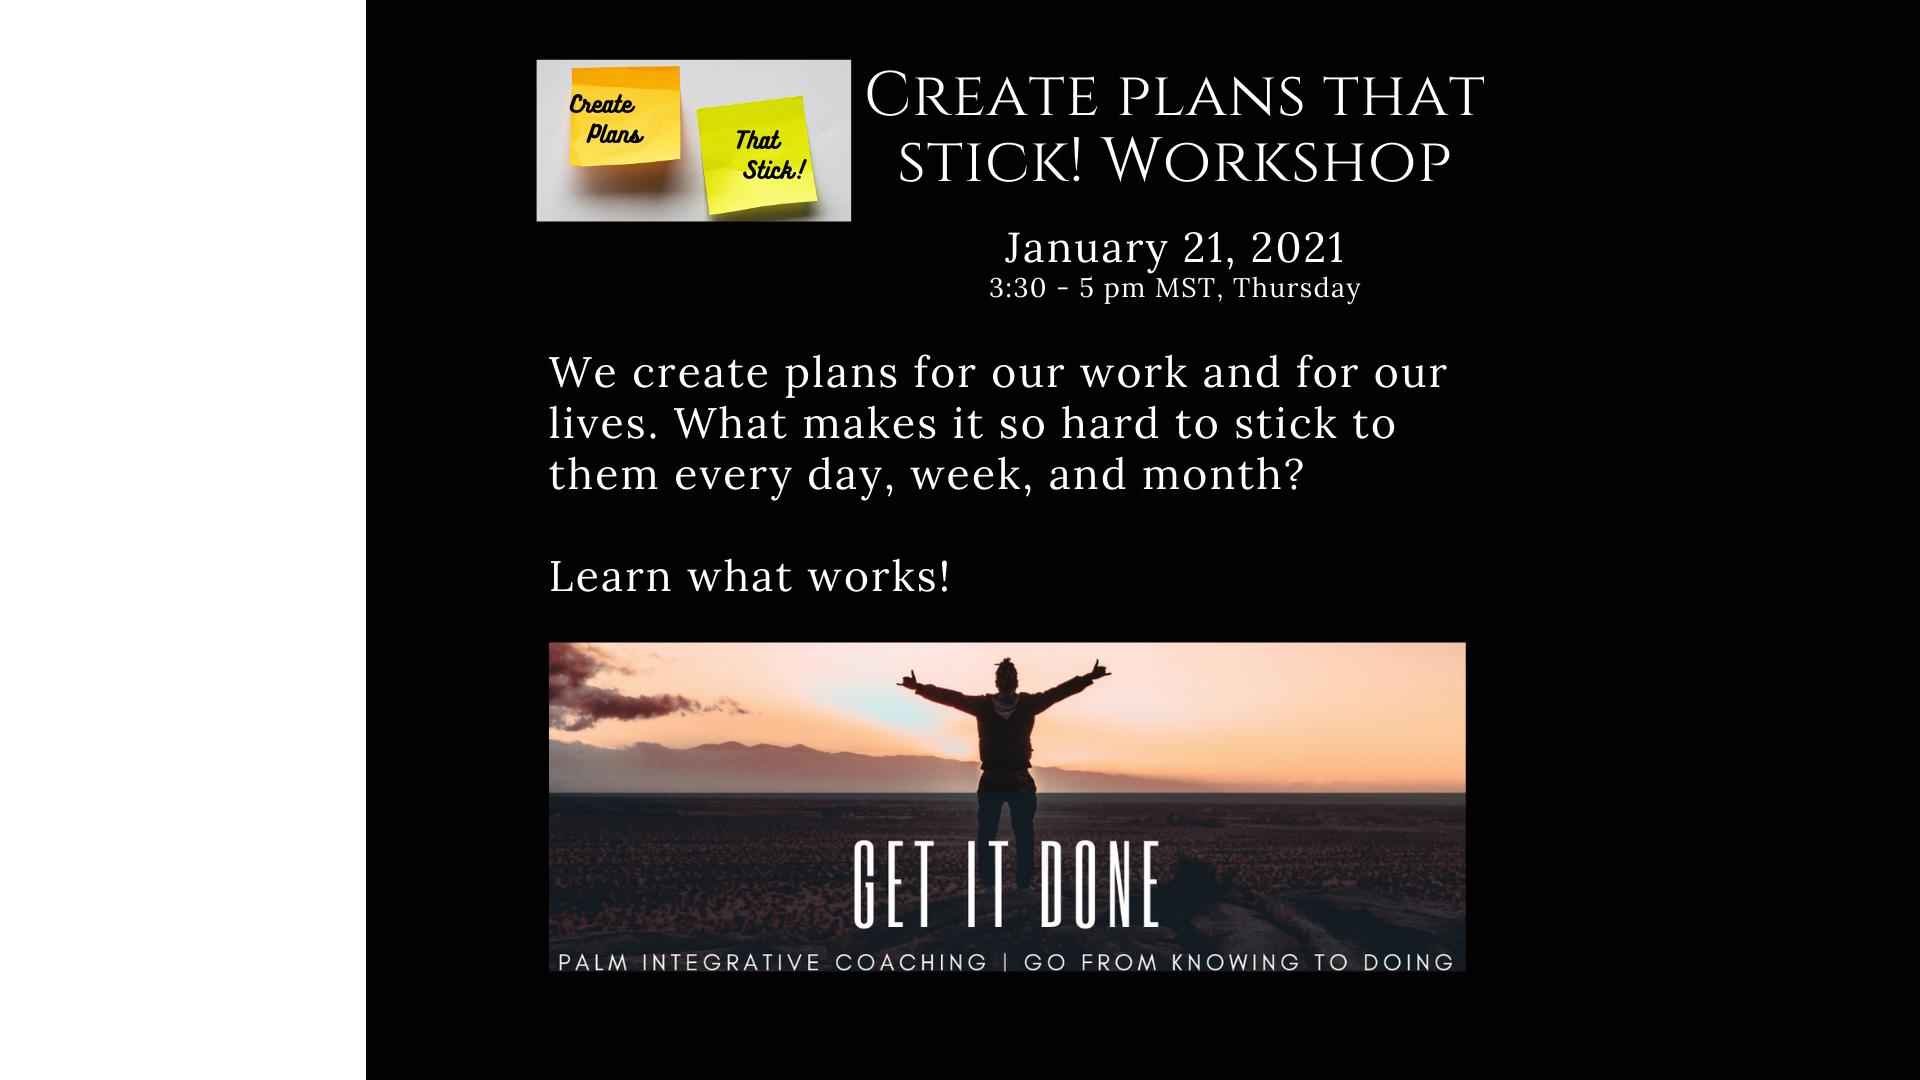 Workshop Follow-Up Session (30 mins)